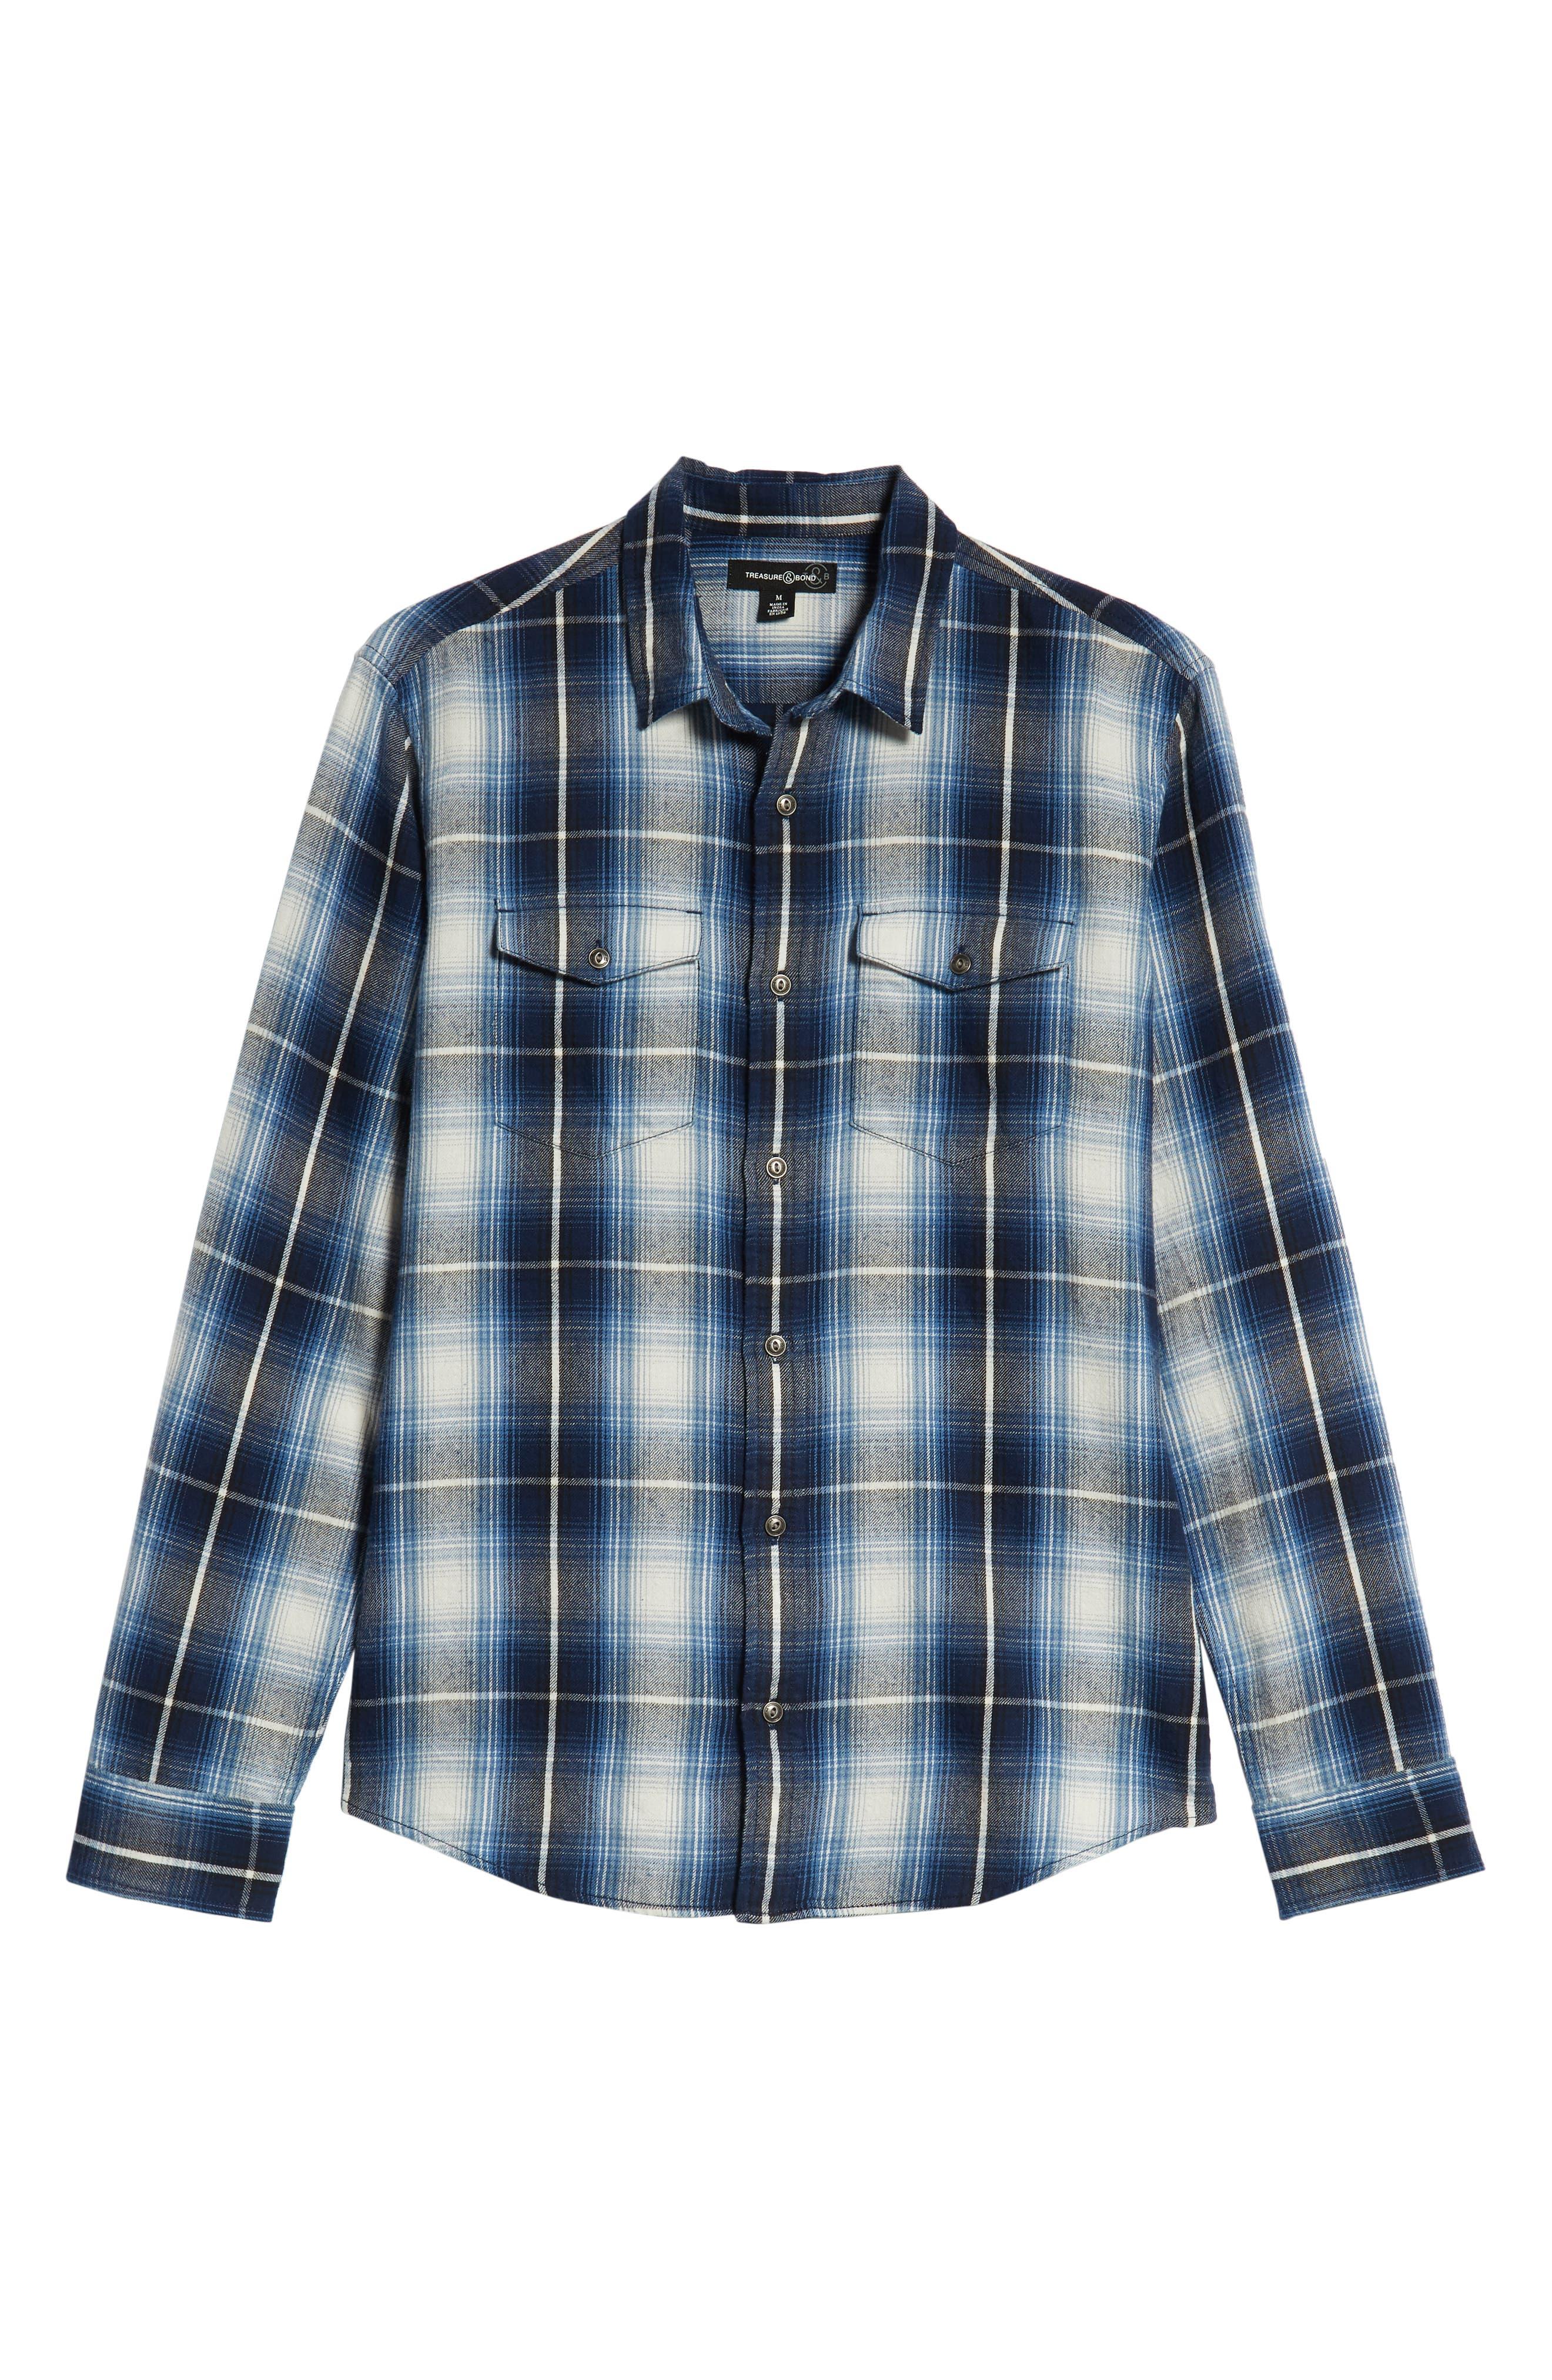 Slim Fit Plaid Flap Pocket Sport Shirt,                             Alternate thumbnail 6, color,                             BLUE CASPIA RIVER PLAID